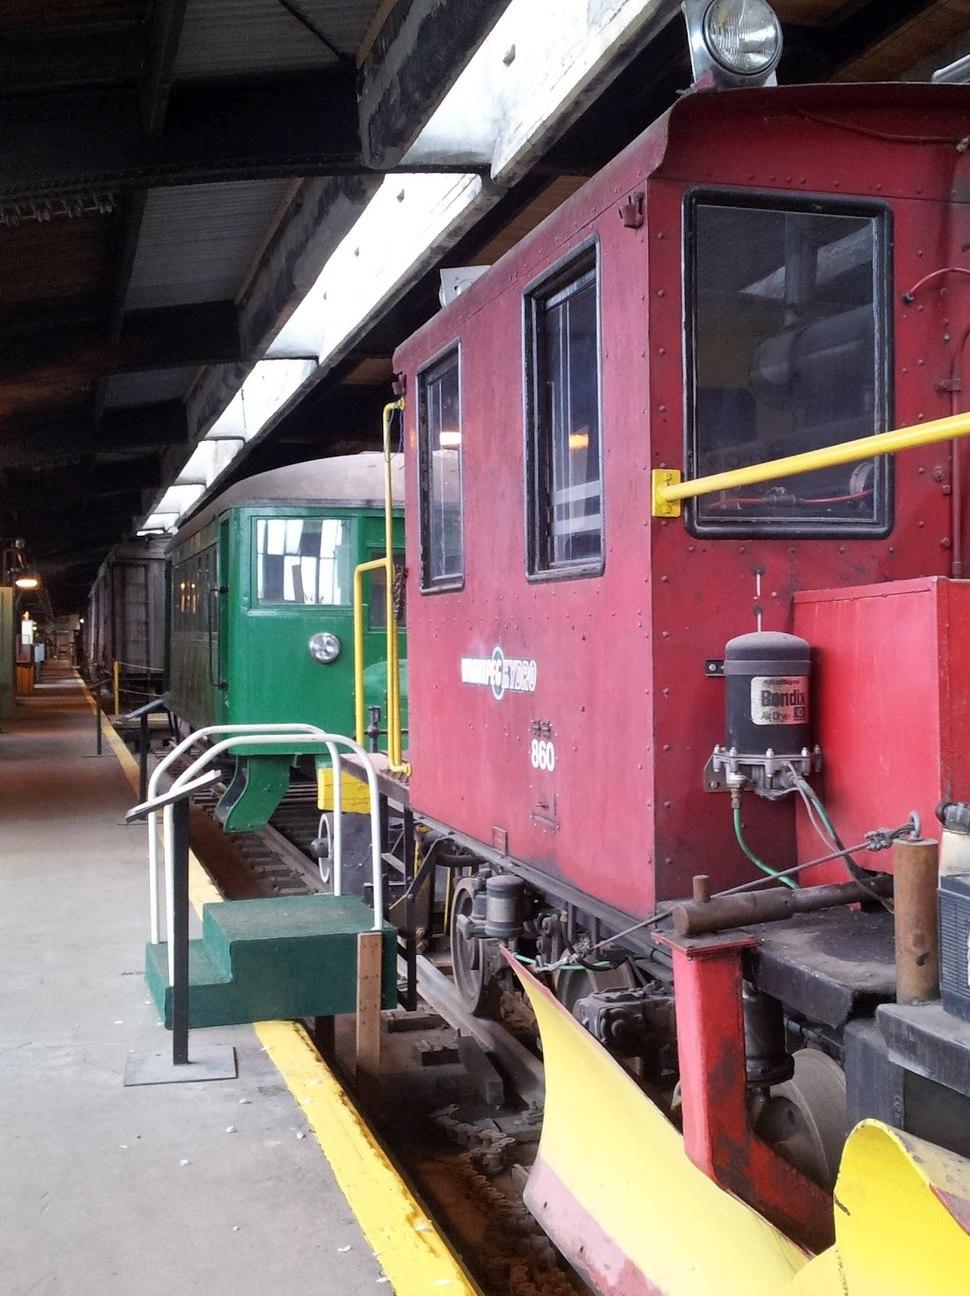 Winnipeg Hydro train at Winnipeg Railway Museum